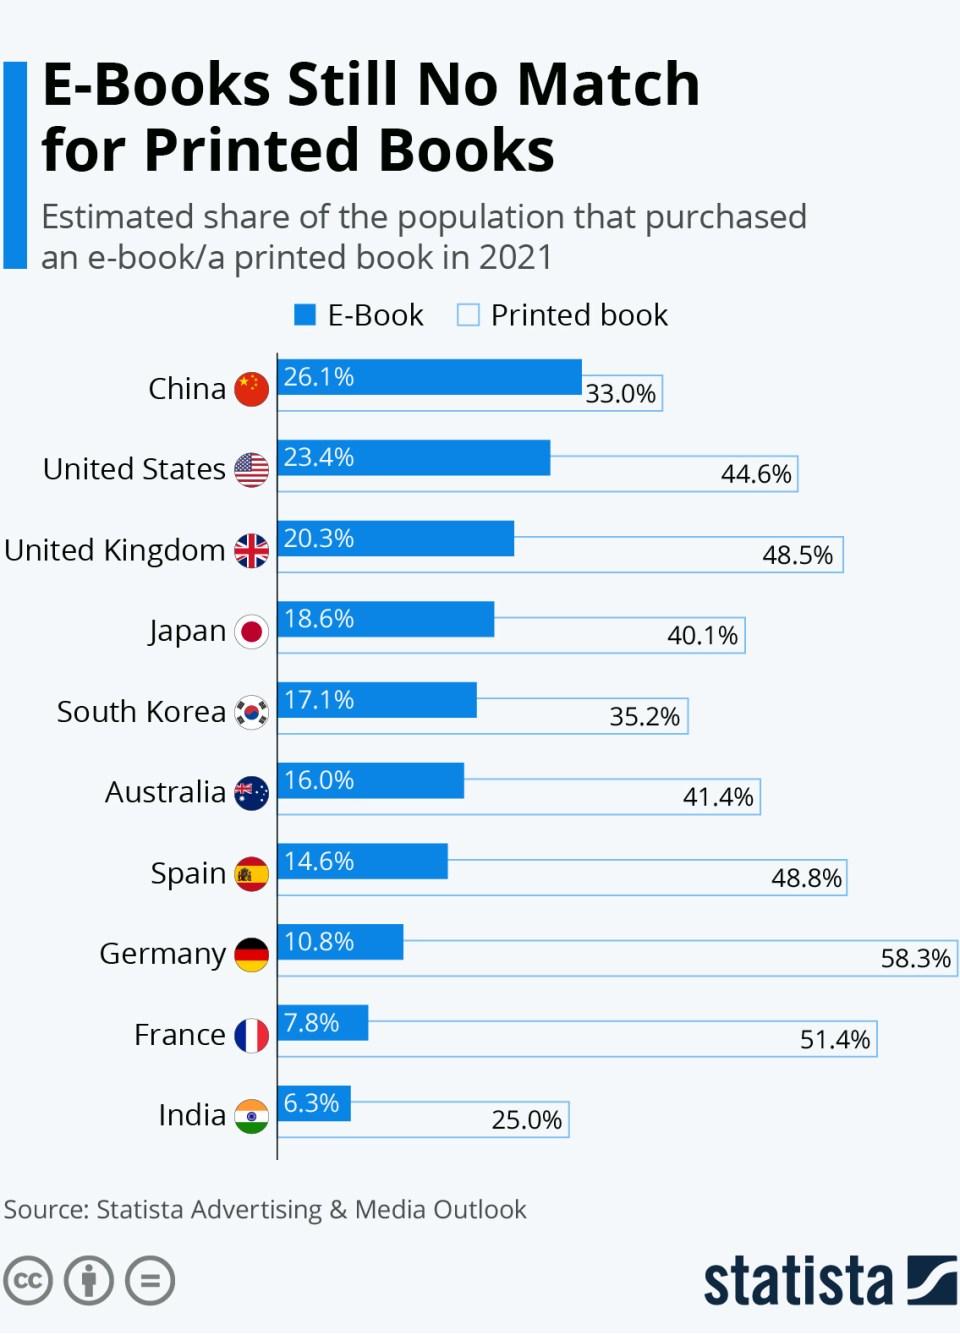 Print Books Still Outsell E-Books